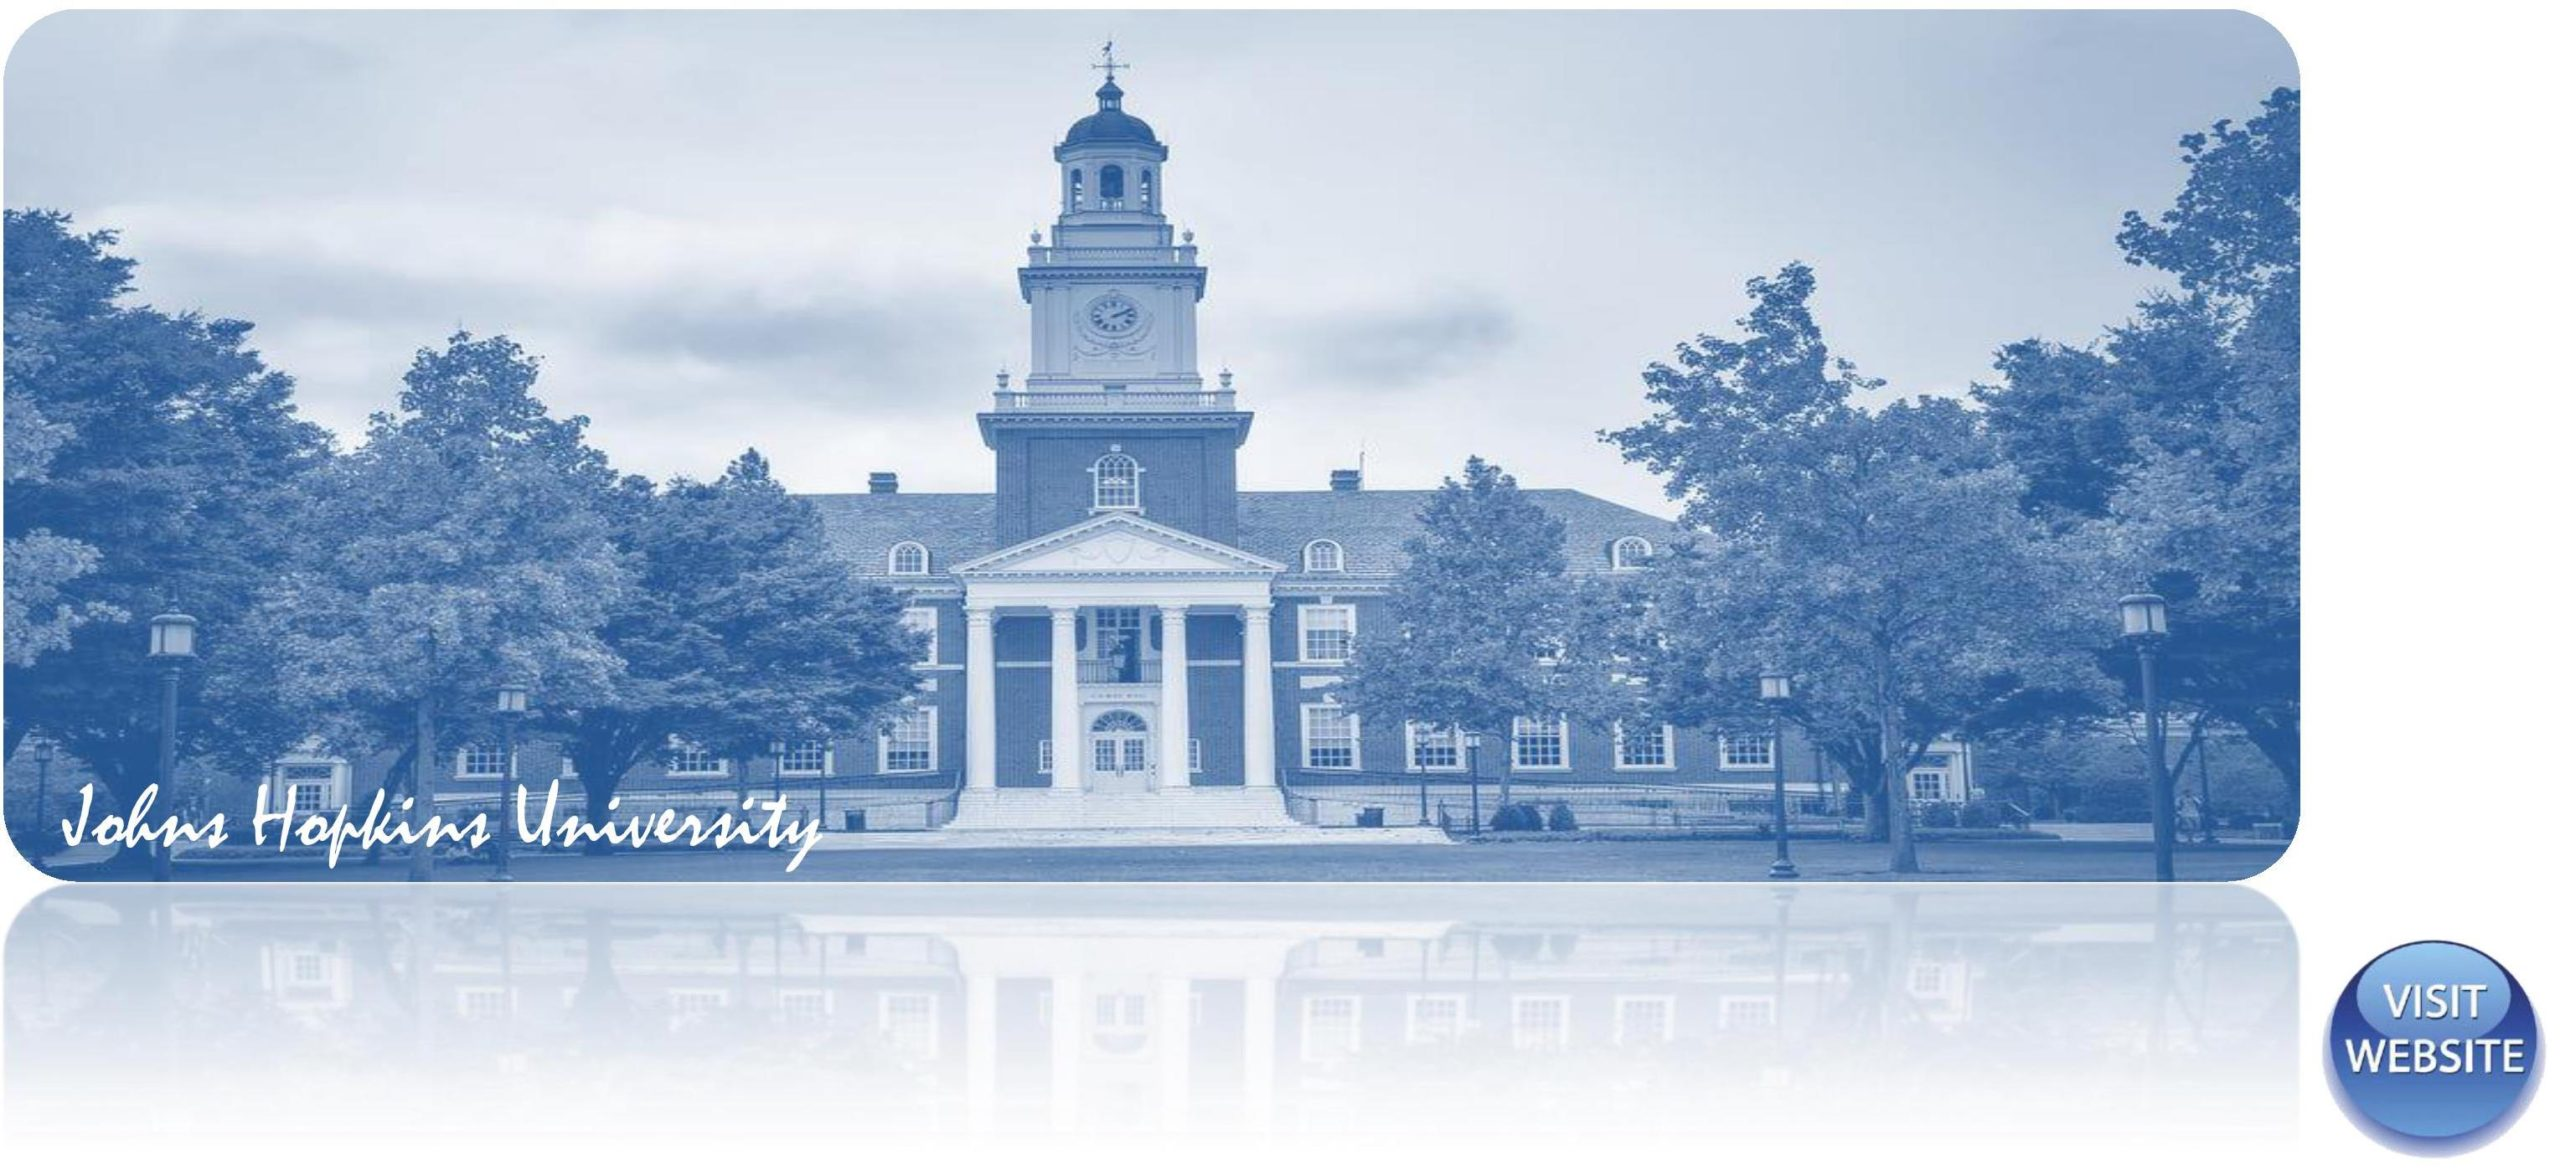 Johns Hopkins University_USA